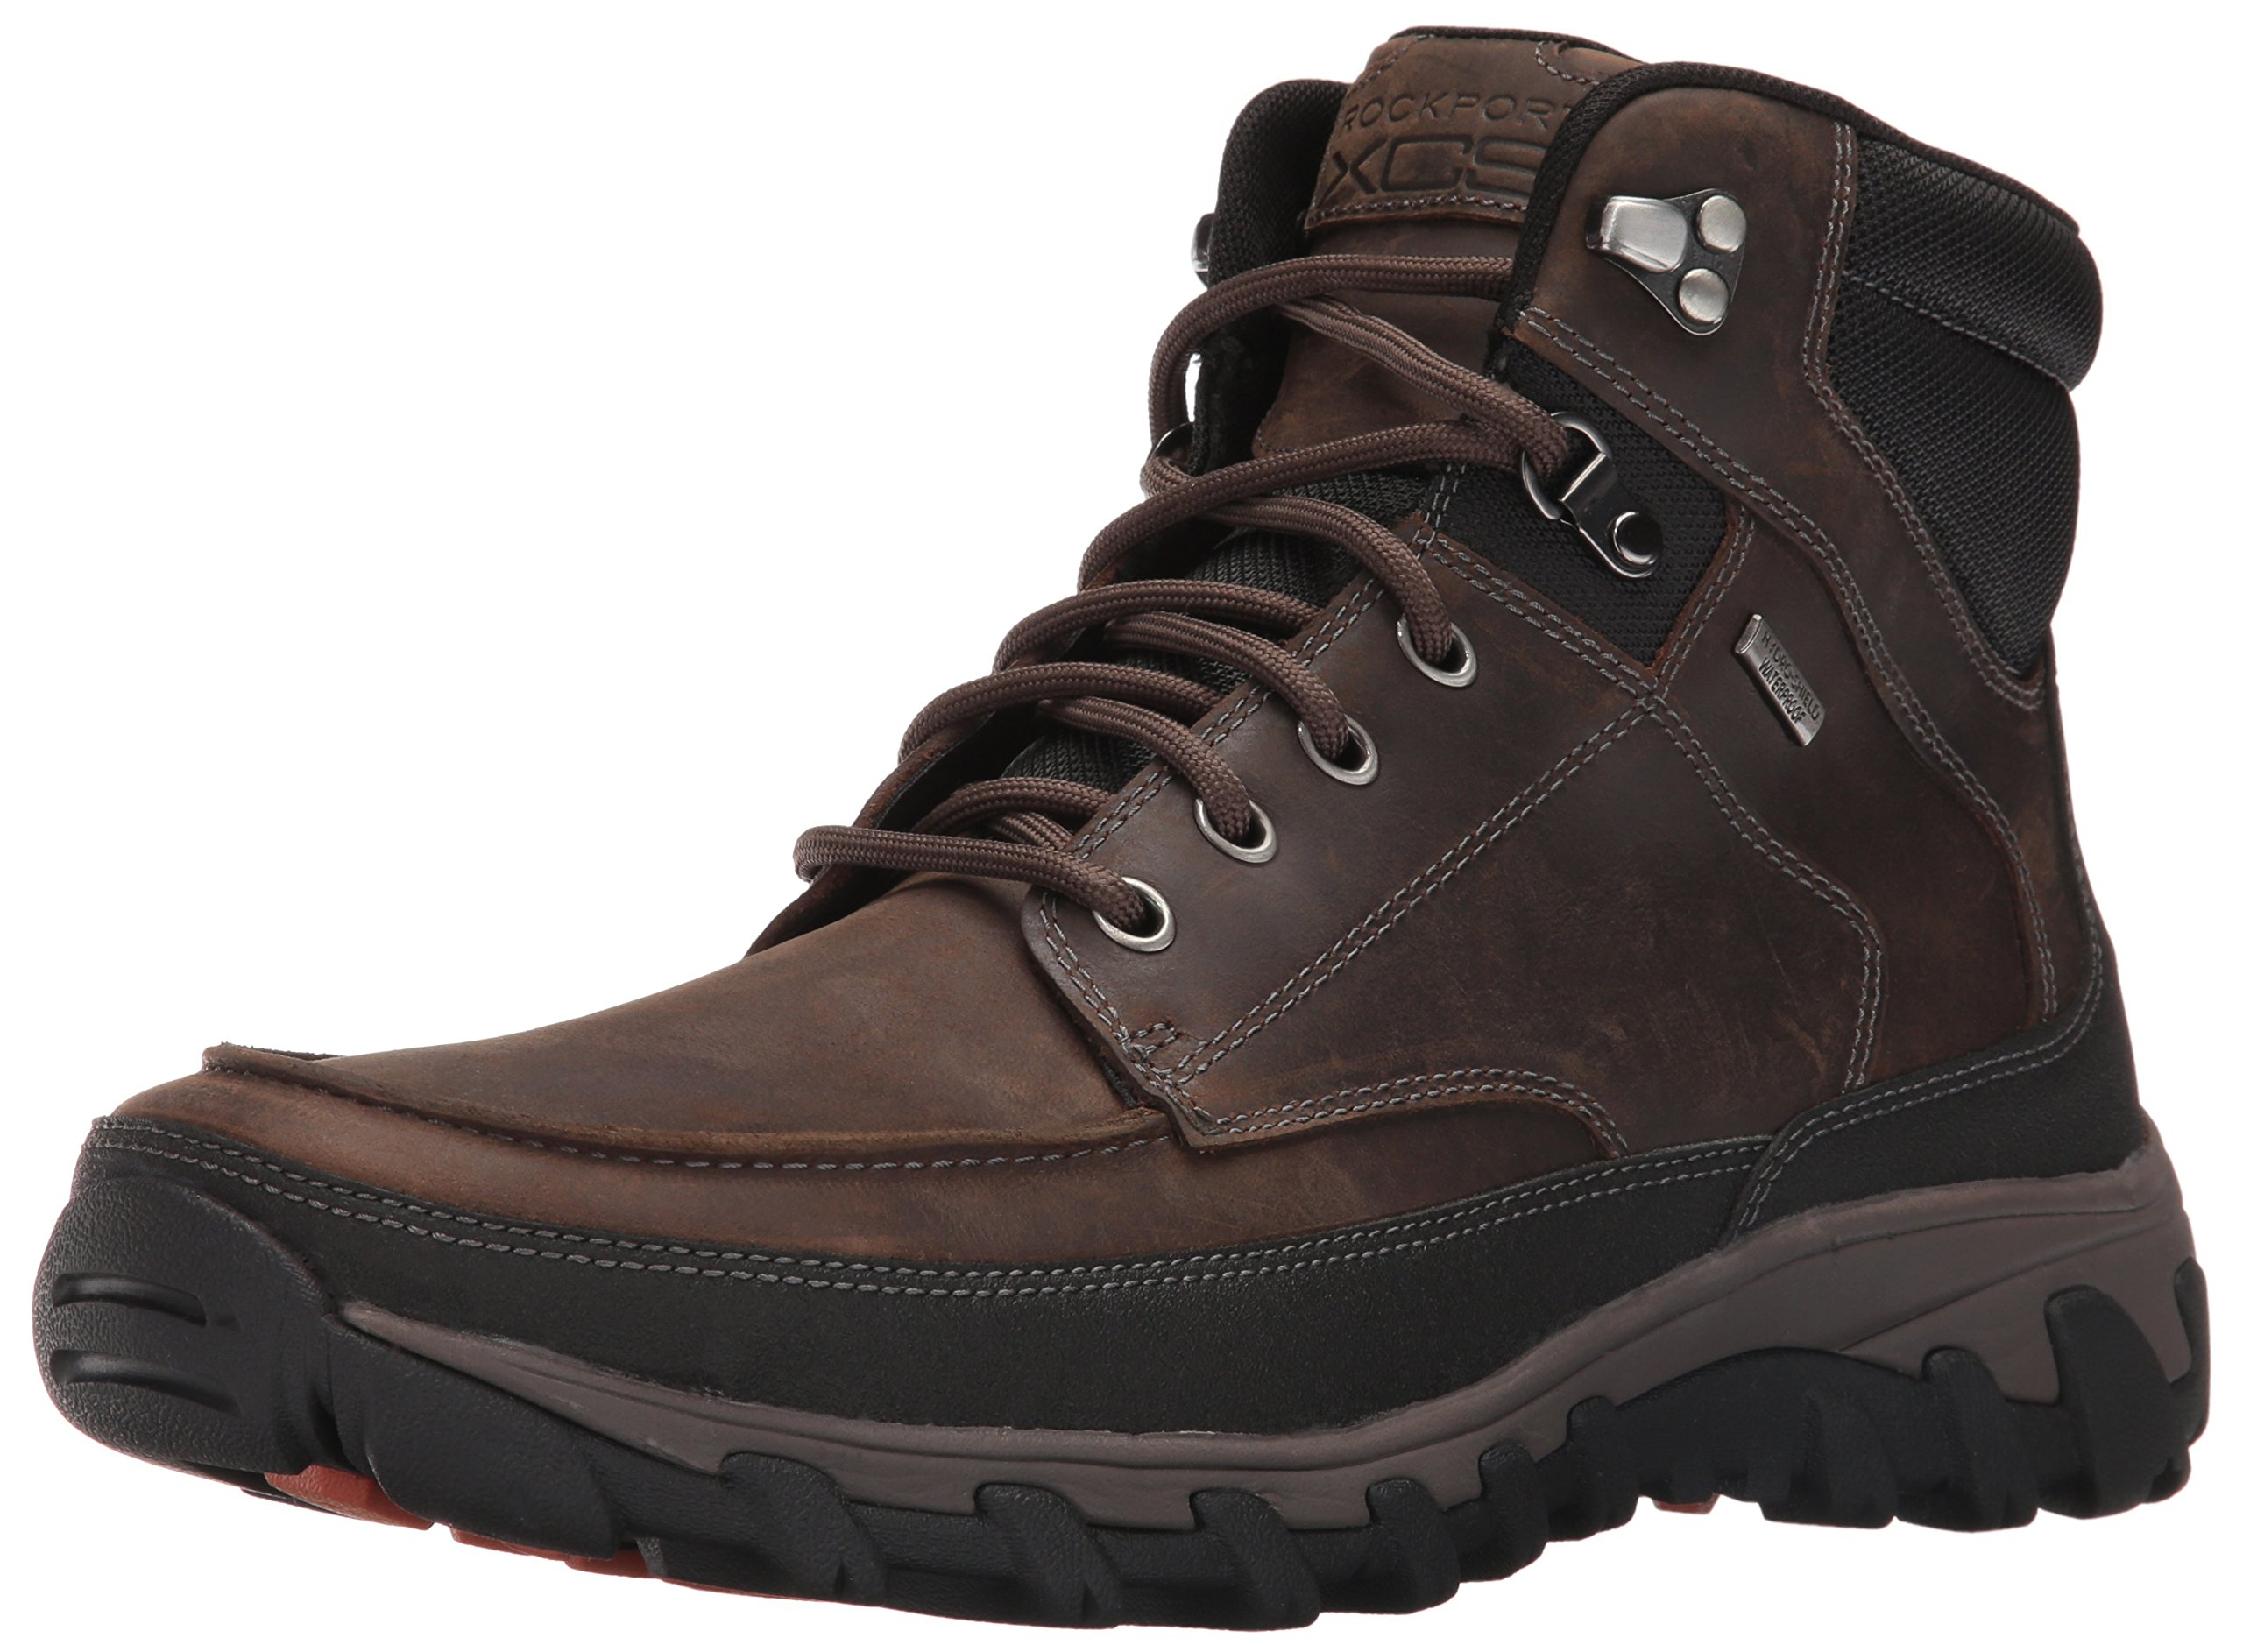 Rockport Mens Springs Boot Brown 10